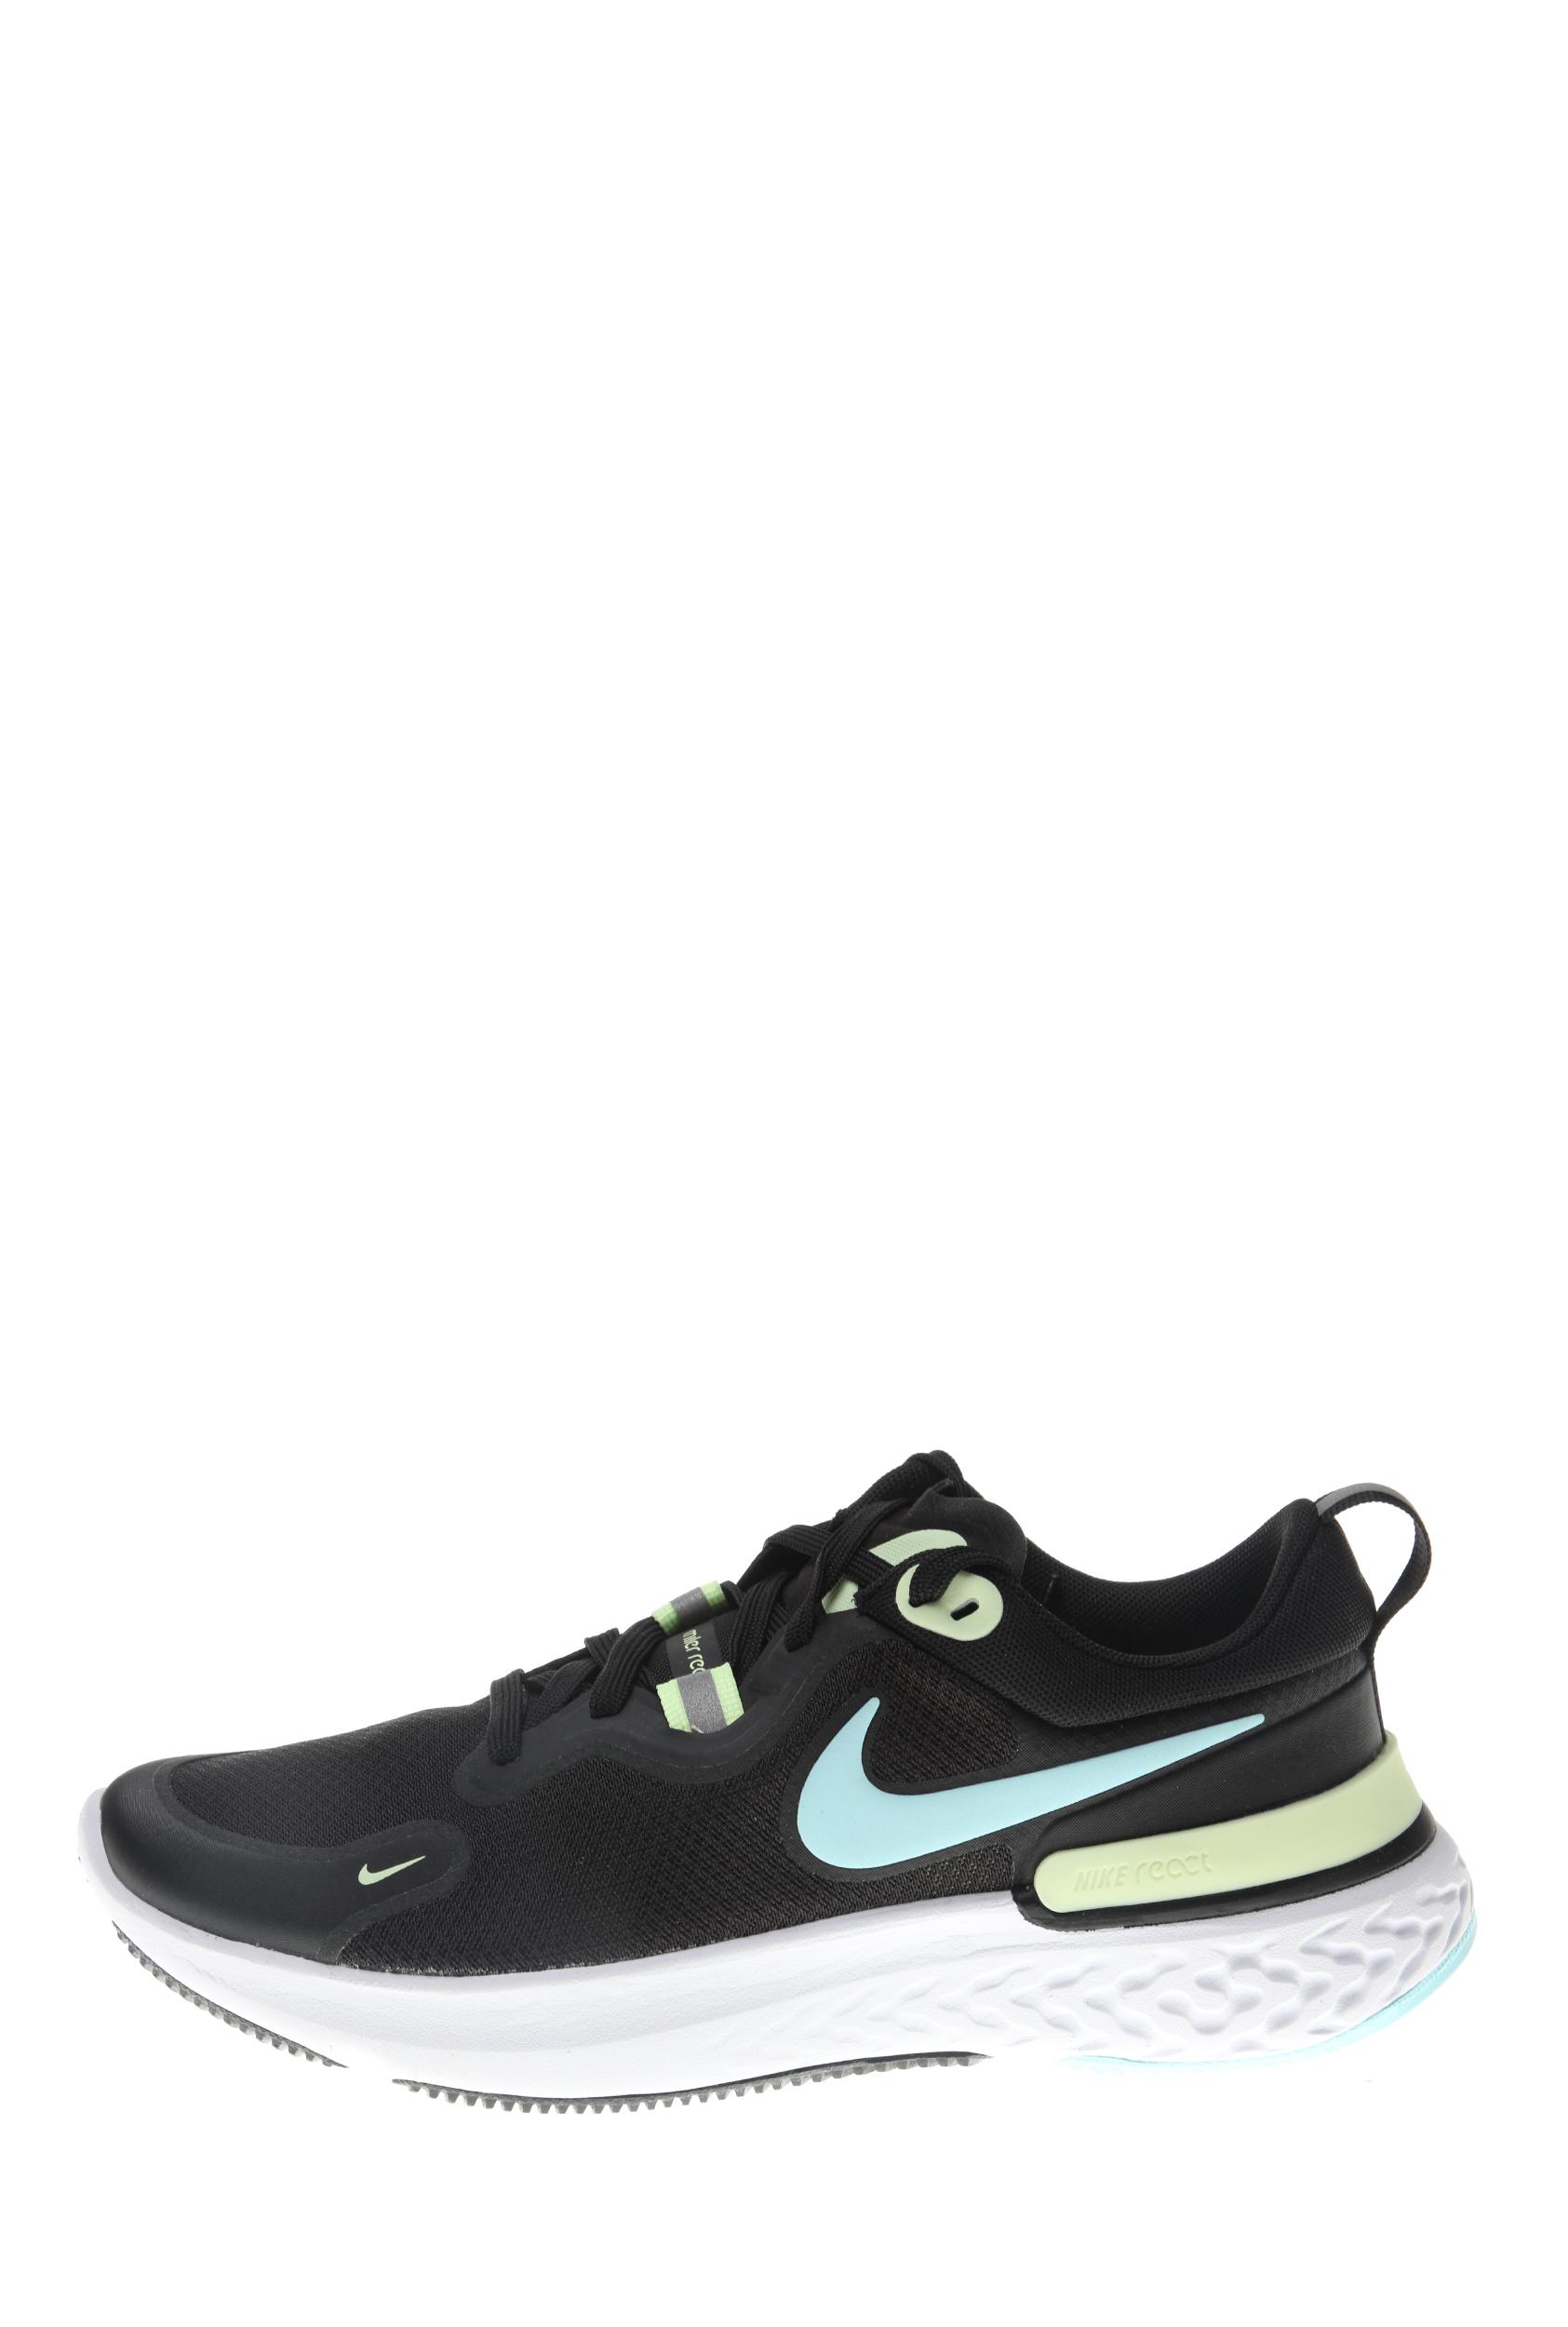 NIKE – Γυναικείο παπούτσι για τρέξιμο NIKE REACT MILER μαύρο